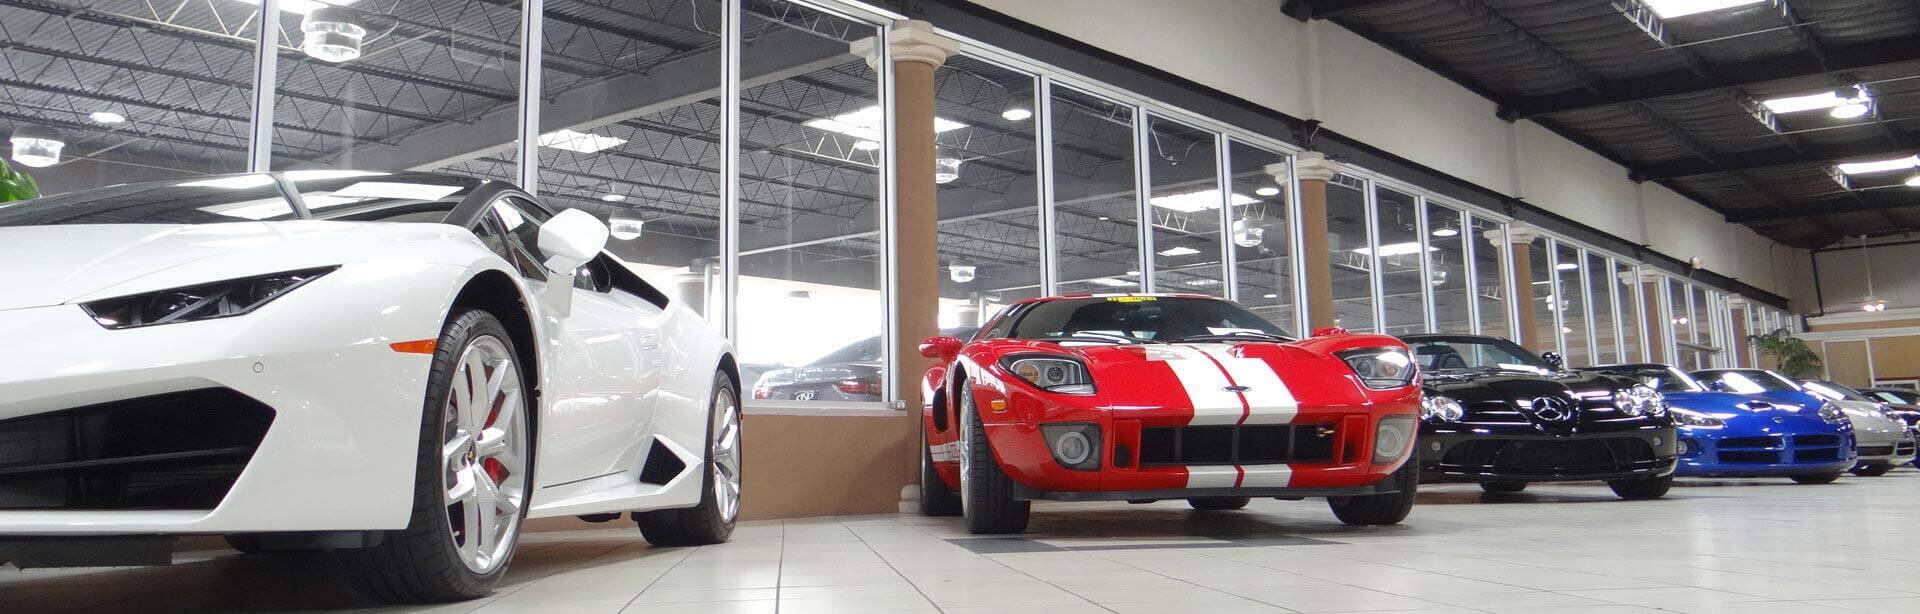 Luxury Pre Owned Dealership Houston Tx Used Cars Nxcess Motorcars